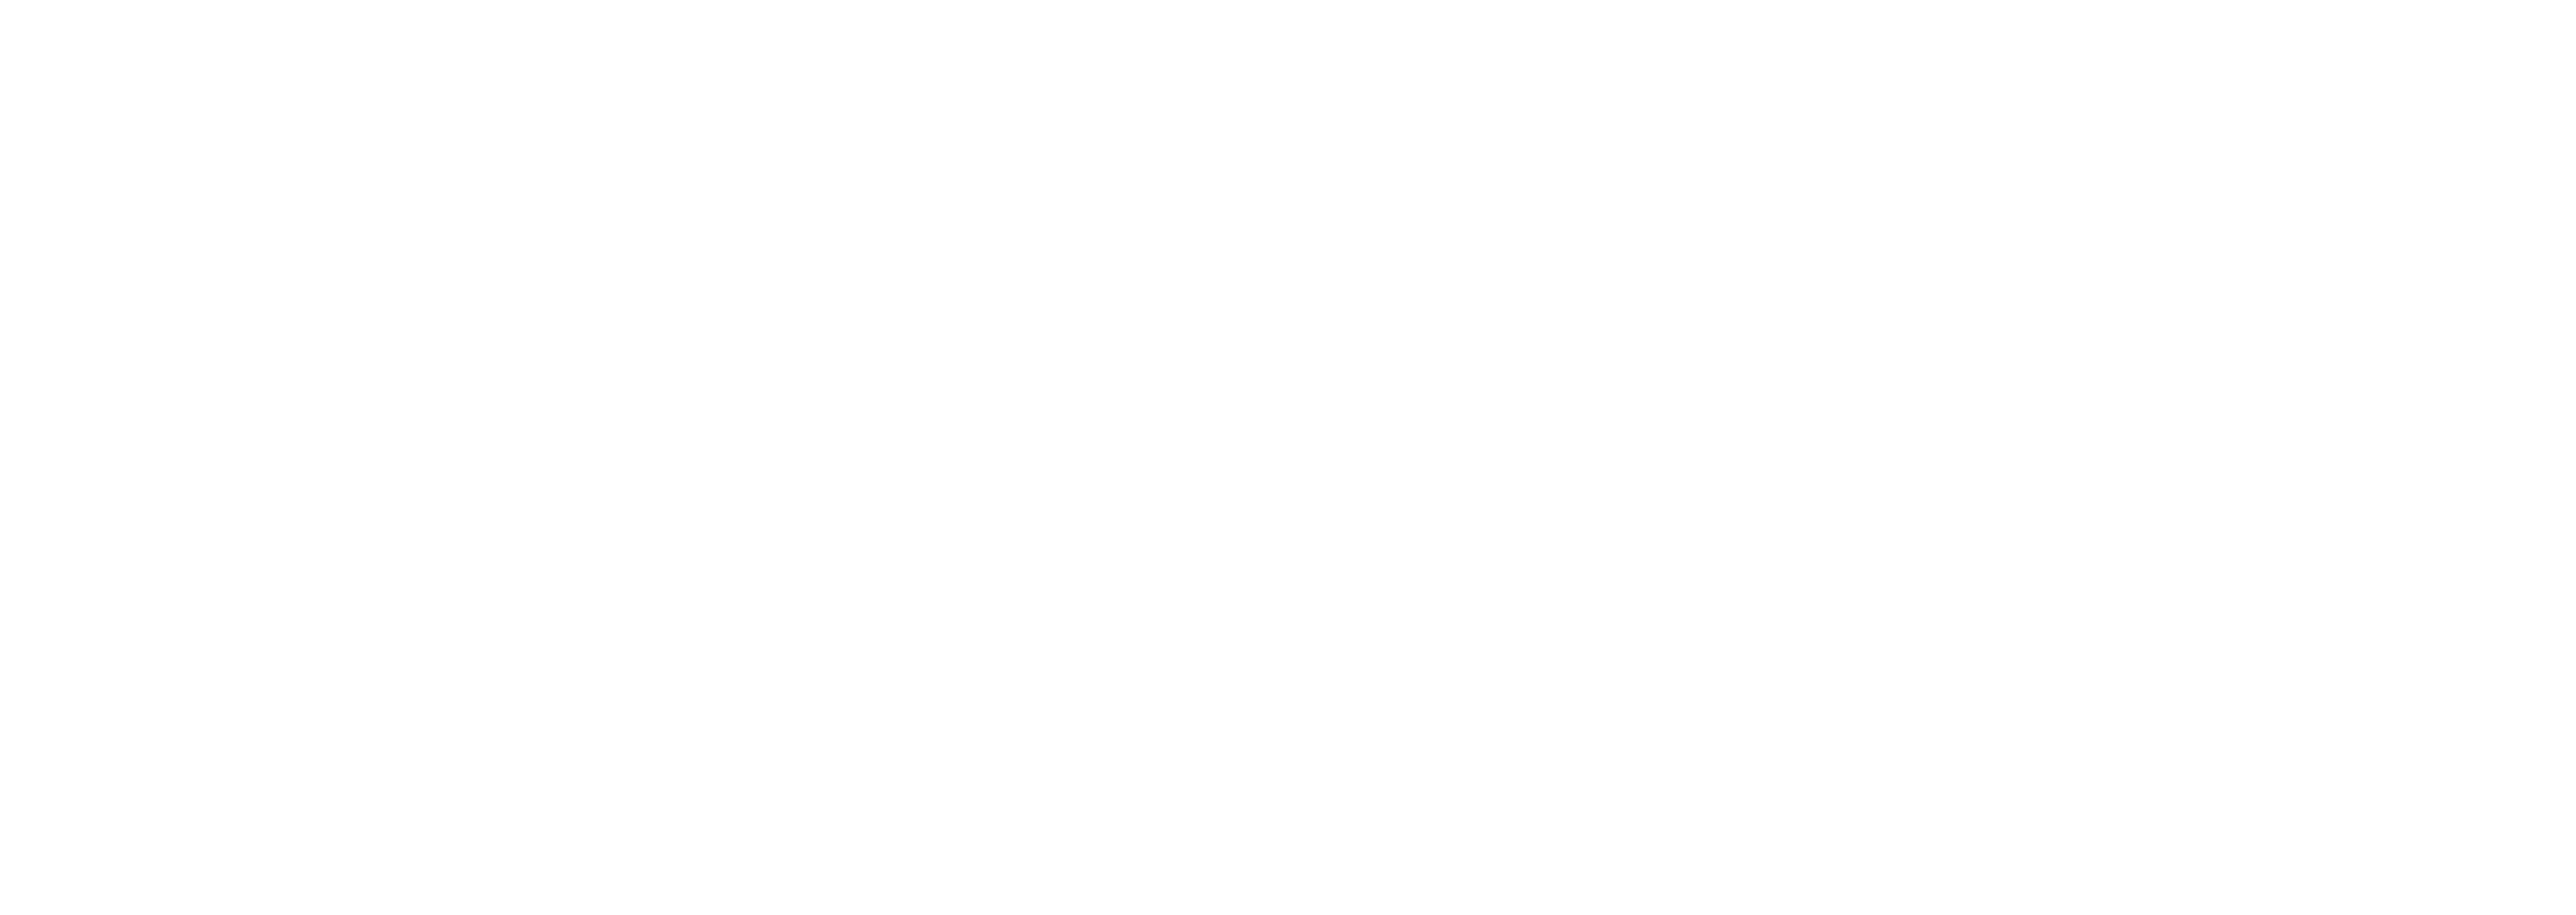 MARPLE logo white